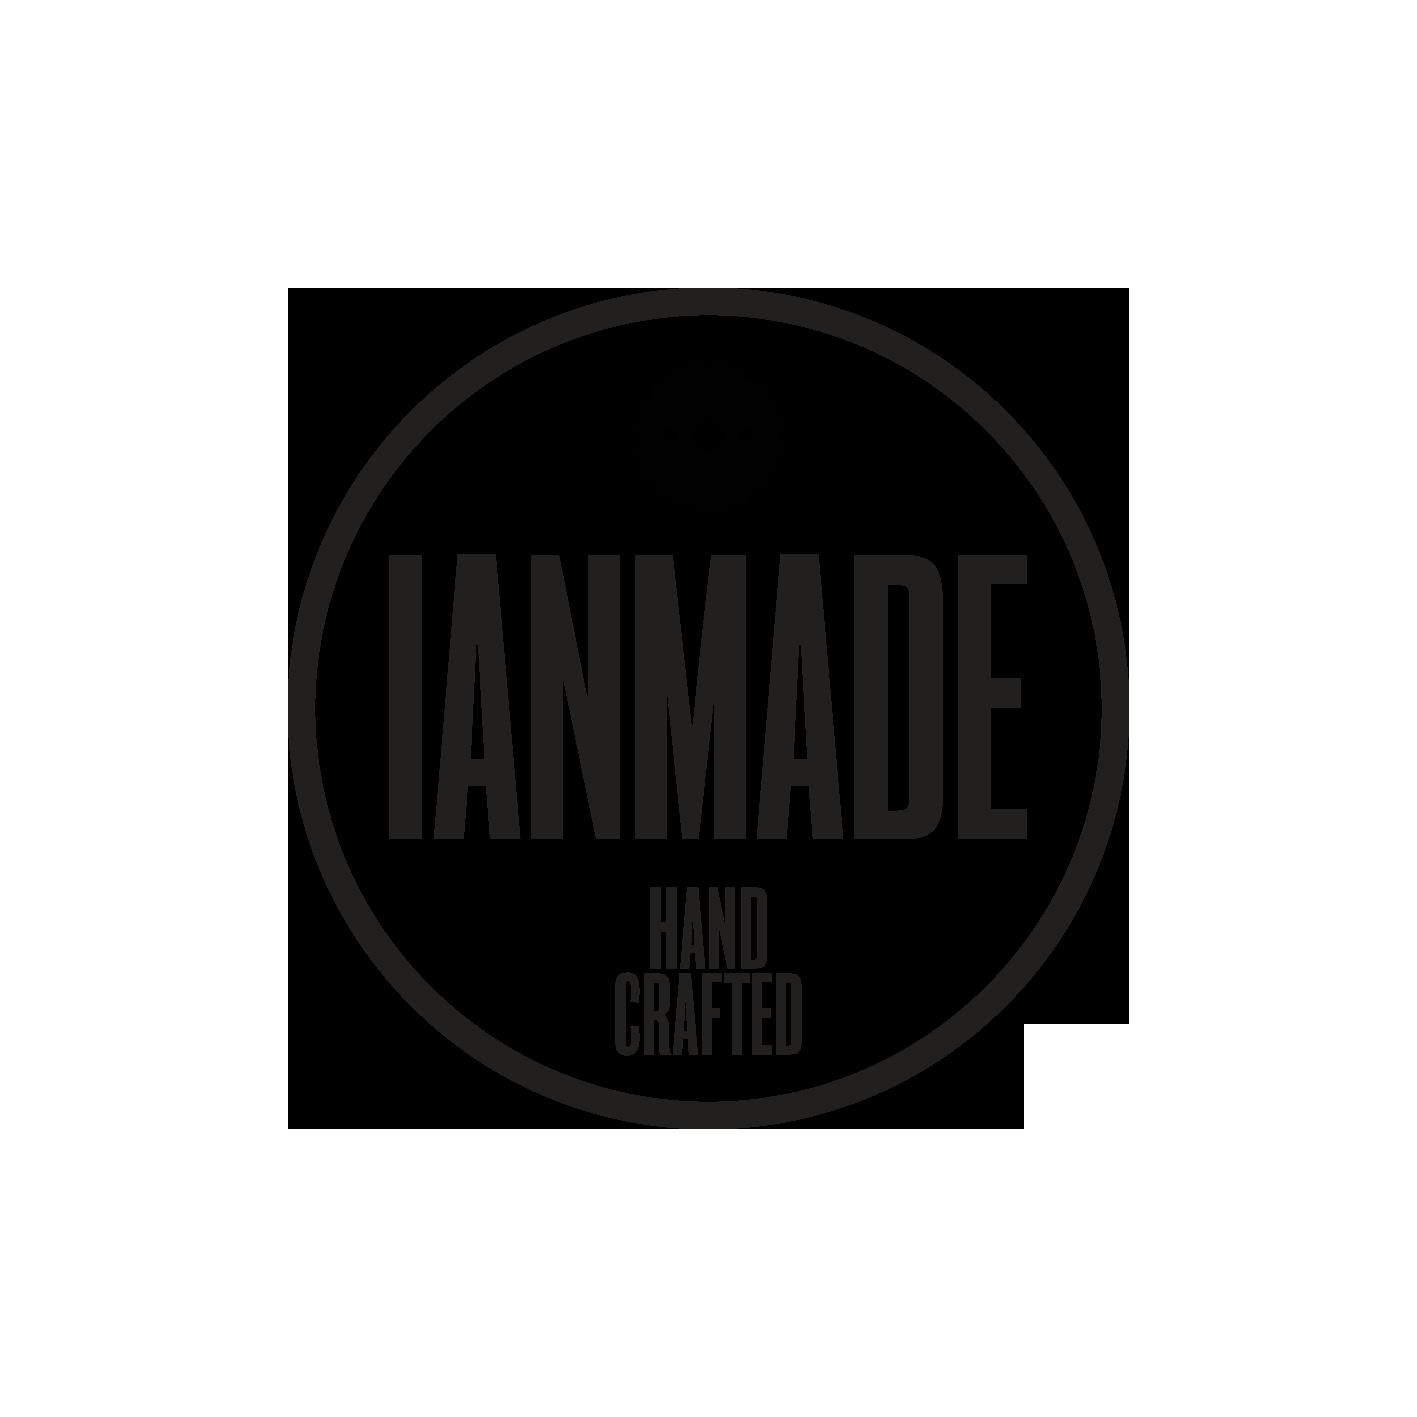 Ianmade